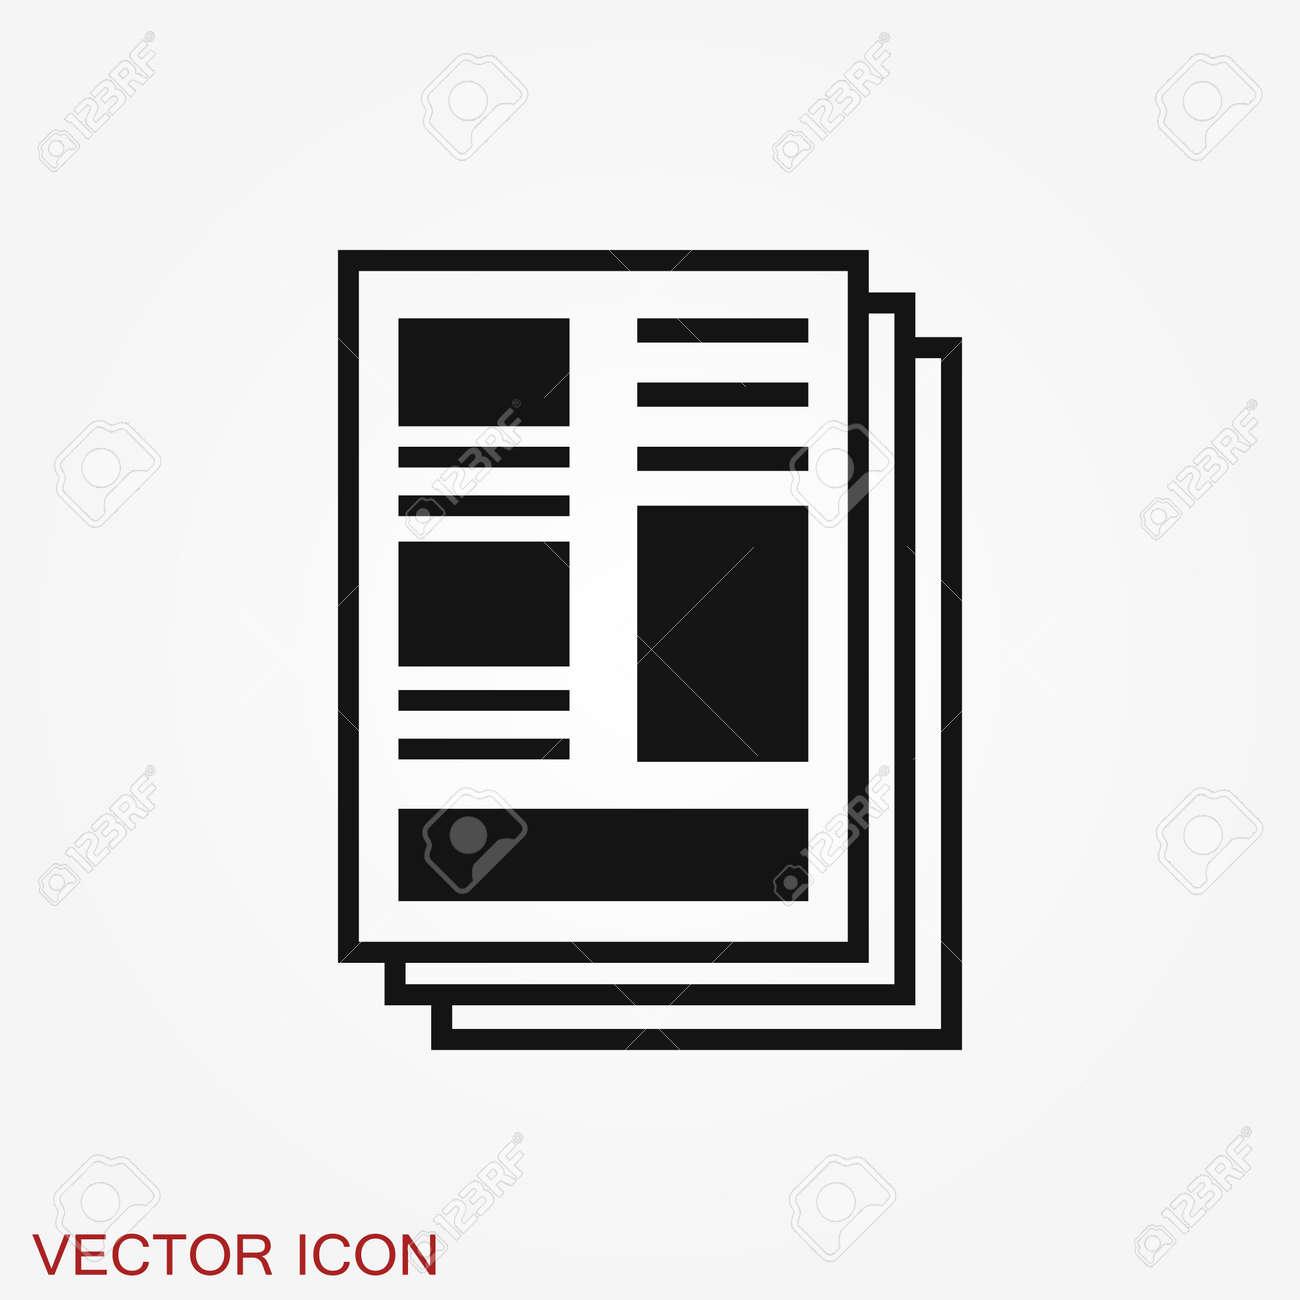 Newspaper icon. Symbol of news. Flat design. - 142882815